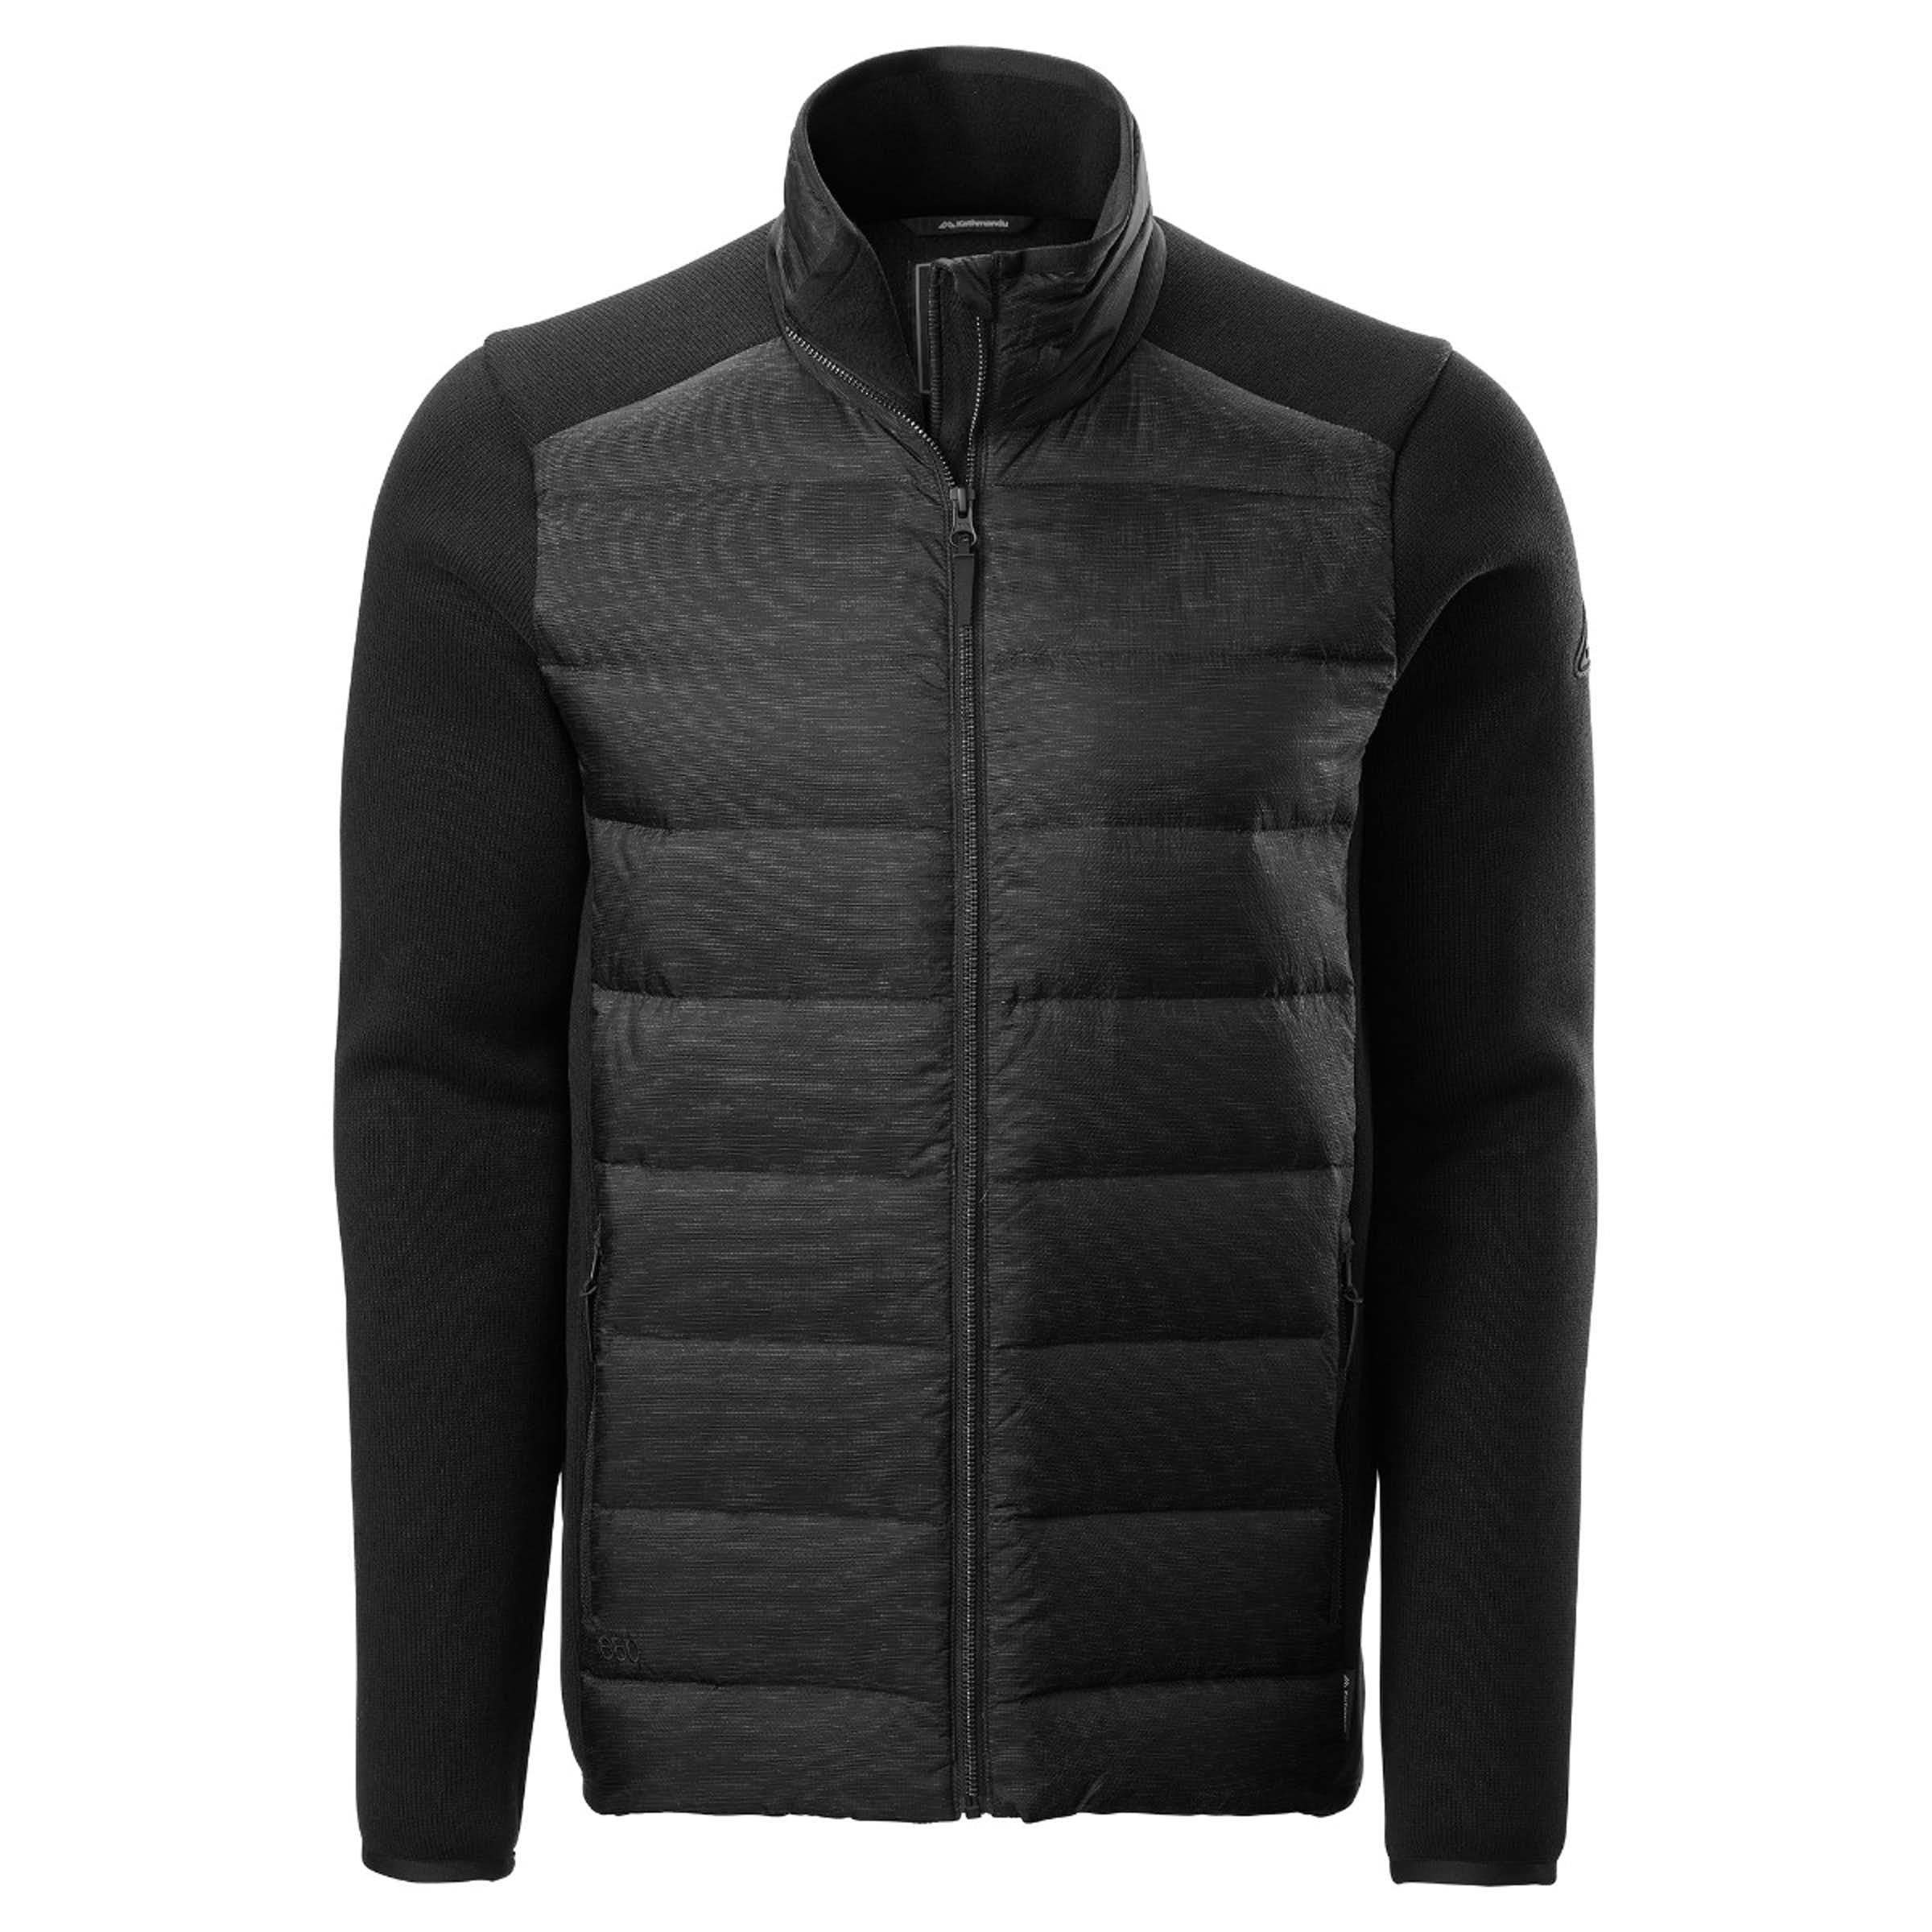 875229824d682 L-TRA Men s Hybrid Down Jacket